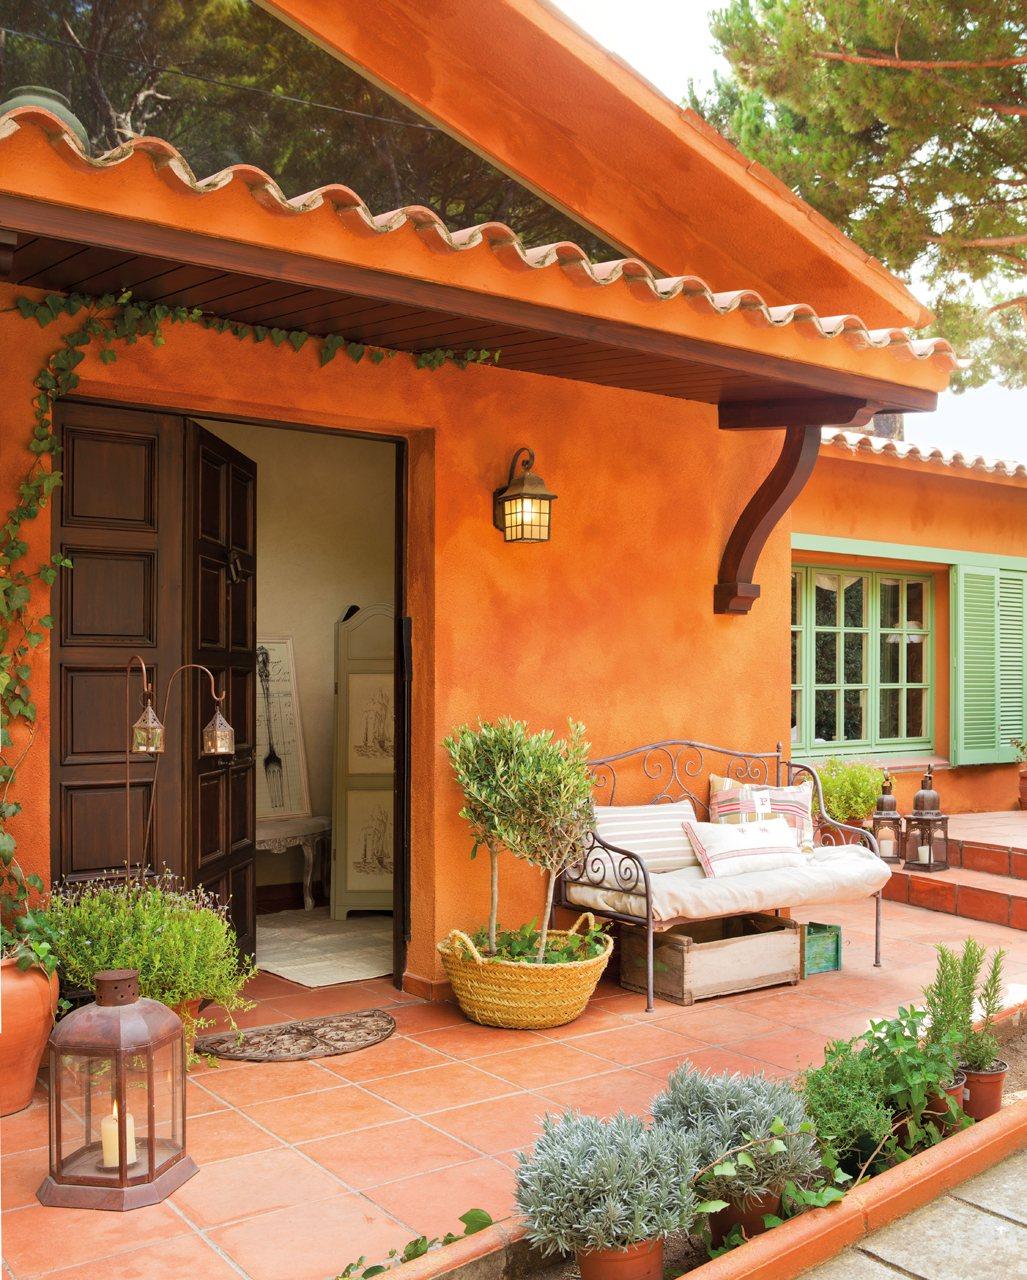 Casa de estilo provenzal - La provenza italiana ...